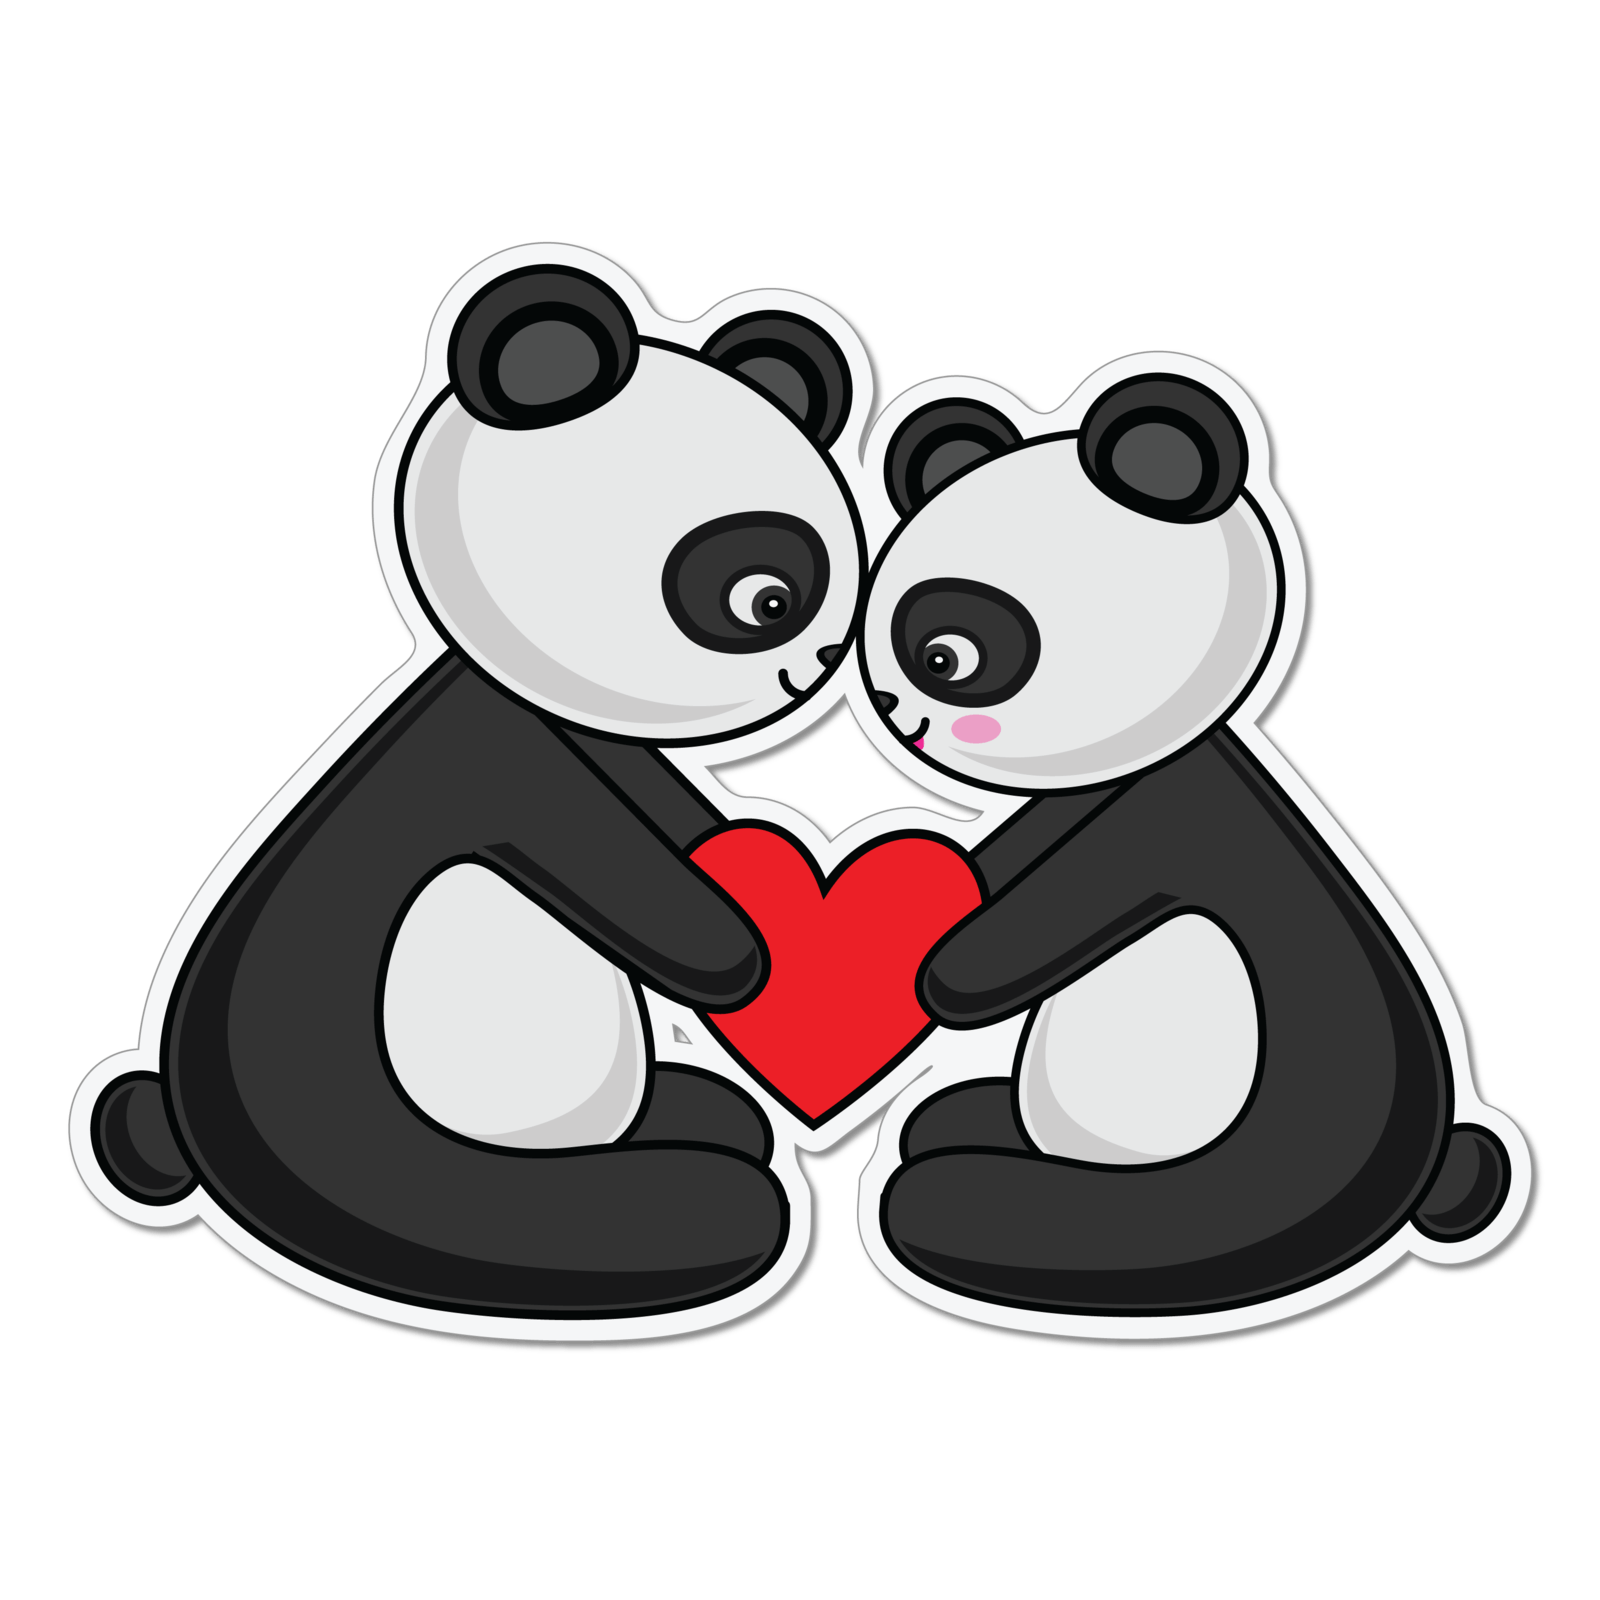 кавайные панды 3